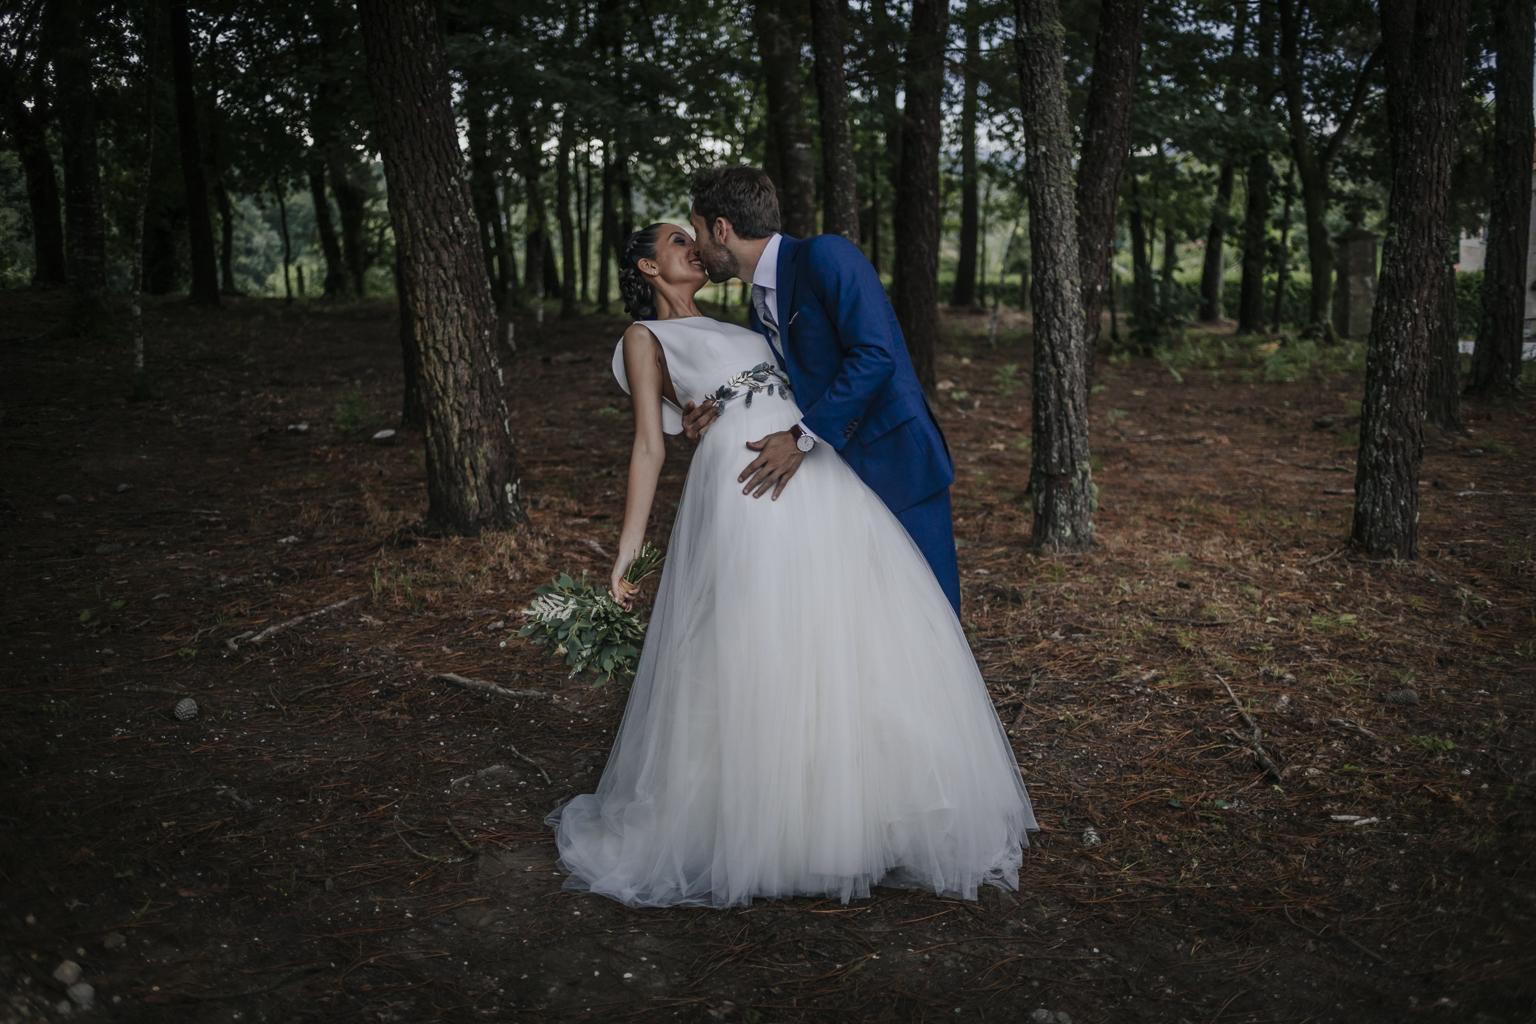 fotógrafo de boda pontevedra :: fotógrafo de boda galicia :: pazo a toxeiriña :: destiny wedding :: international wedding photographer barcelona :: boda sofisticada